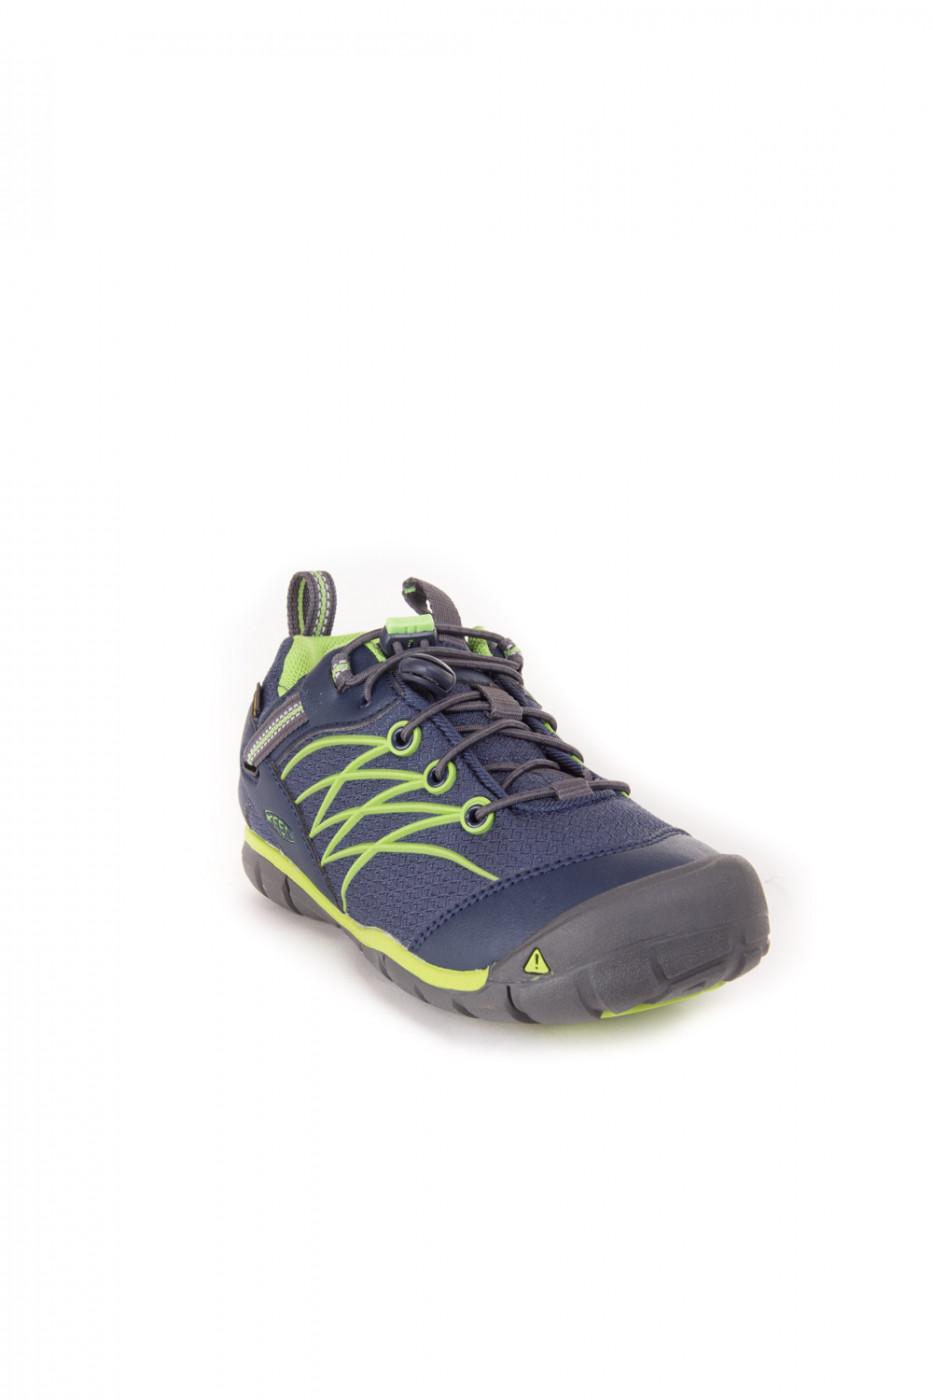 77e998cb97dab Outdoorové boty dětské KEEN CHANDLER CNX WP JR - ALIATIC